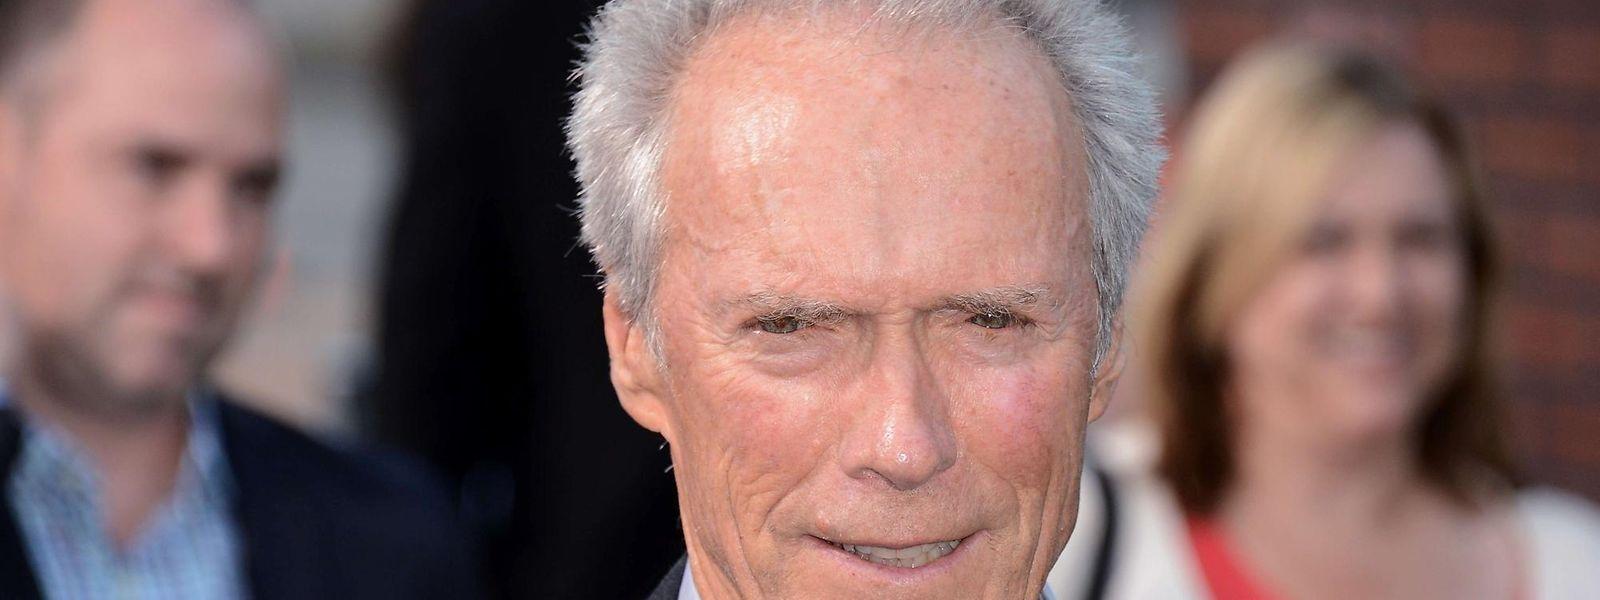 Clint Eastwood scheint zu den wenigen prominenten Trump-Fans zu zählen.